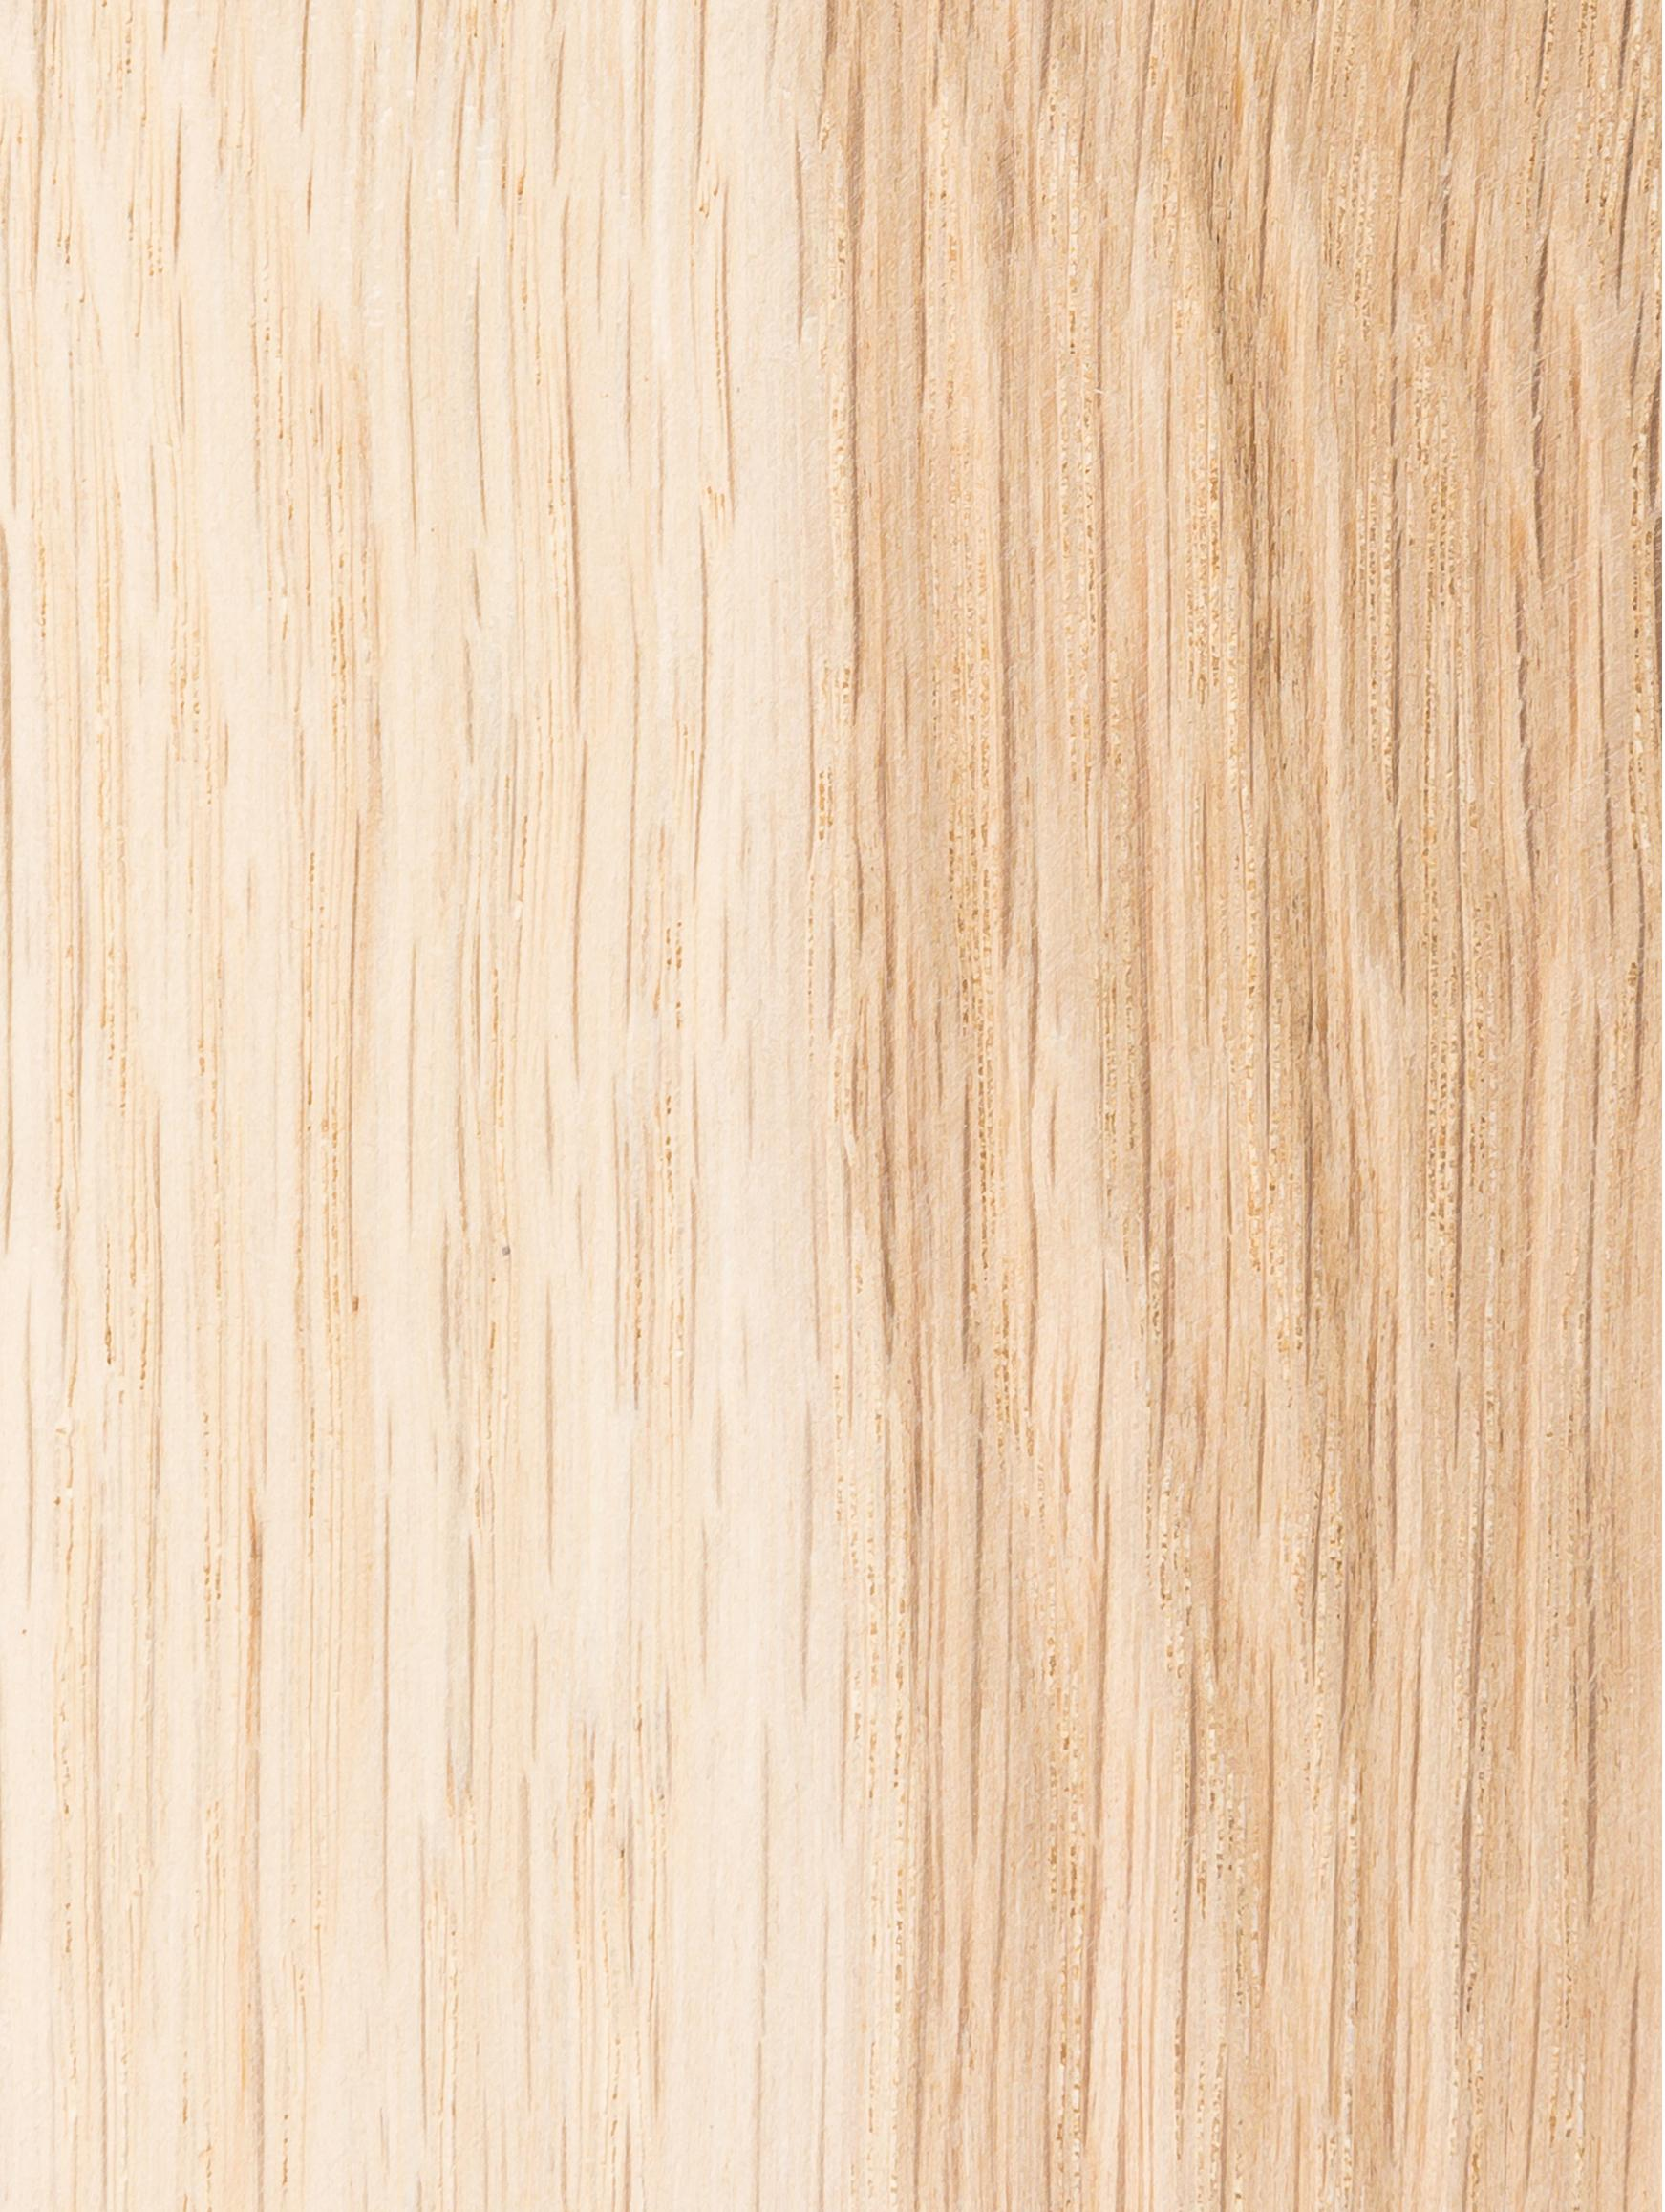 Hocker Block aus massivem Eichenholz, Eichenholz, Eiche, 29 x 40 cm